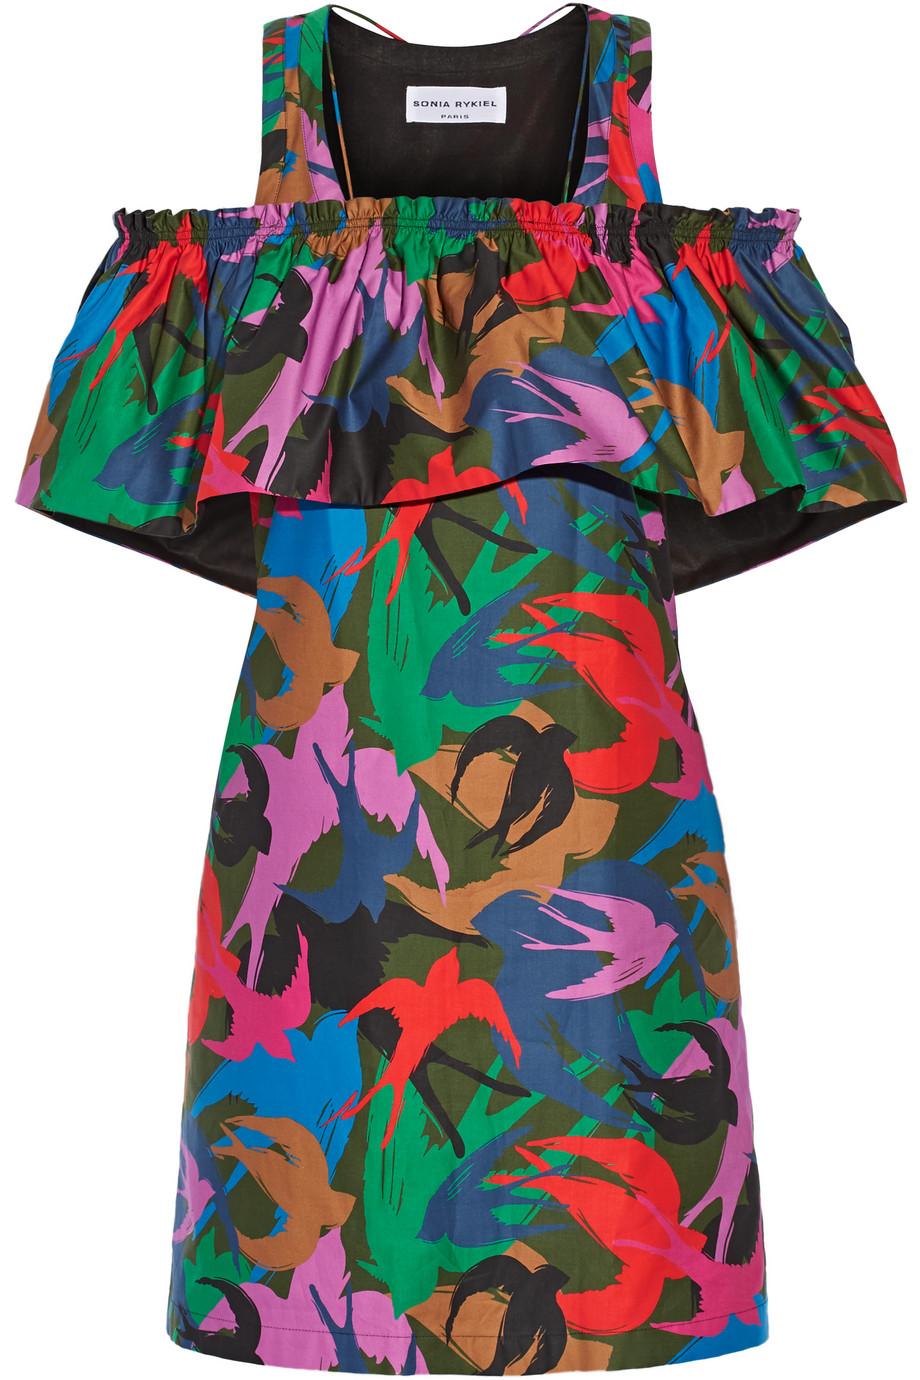 Sonia Rykiel Off-the-Shoulder Printed Cotton-Poplin Mini Dress, Green, Women's, Size: 40